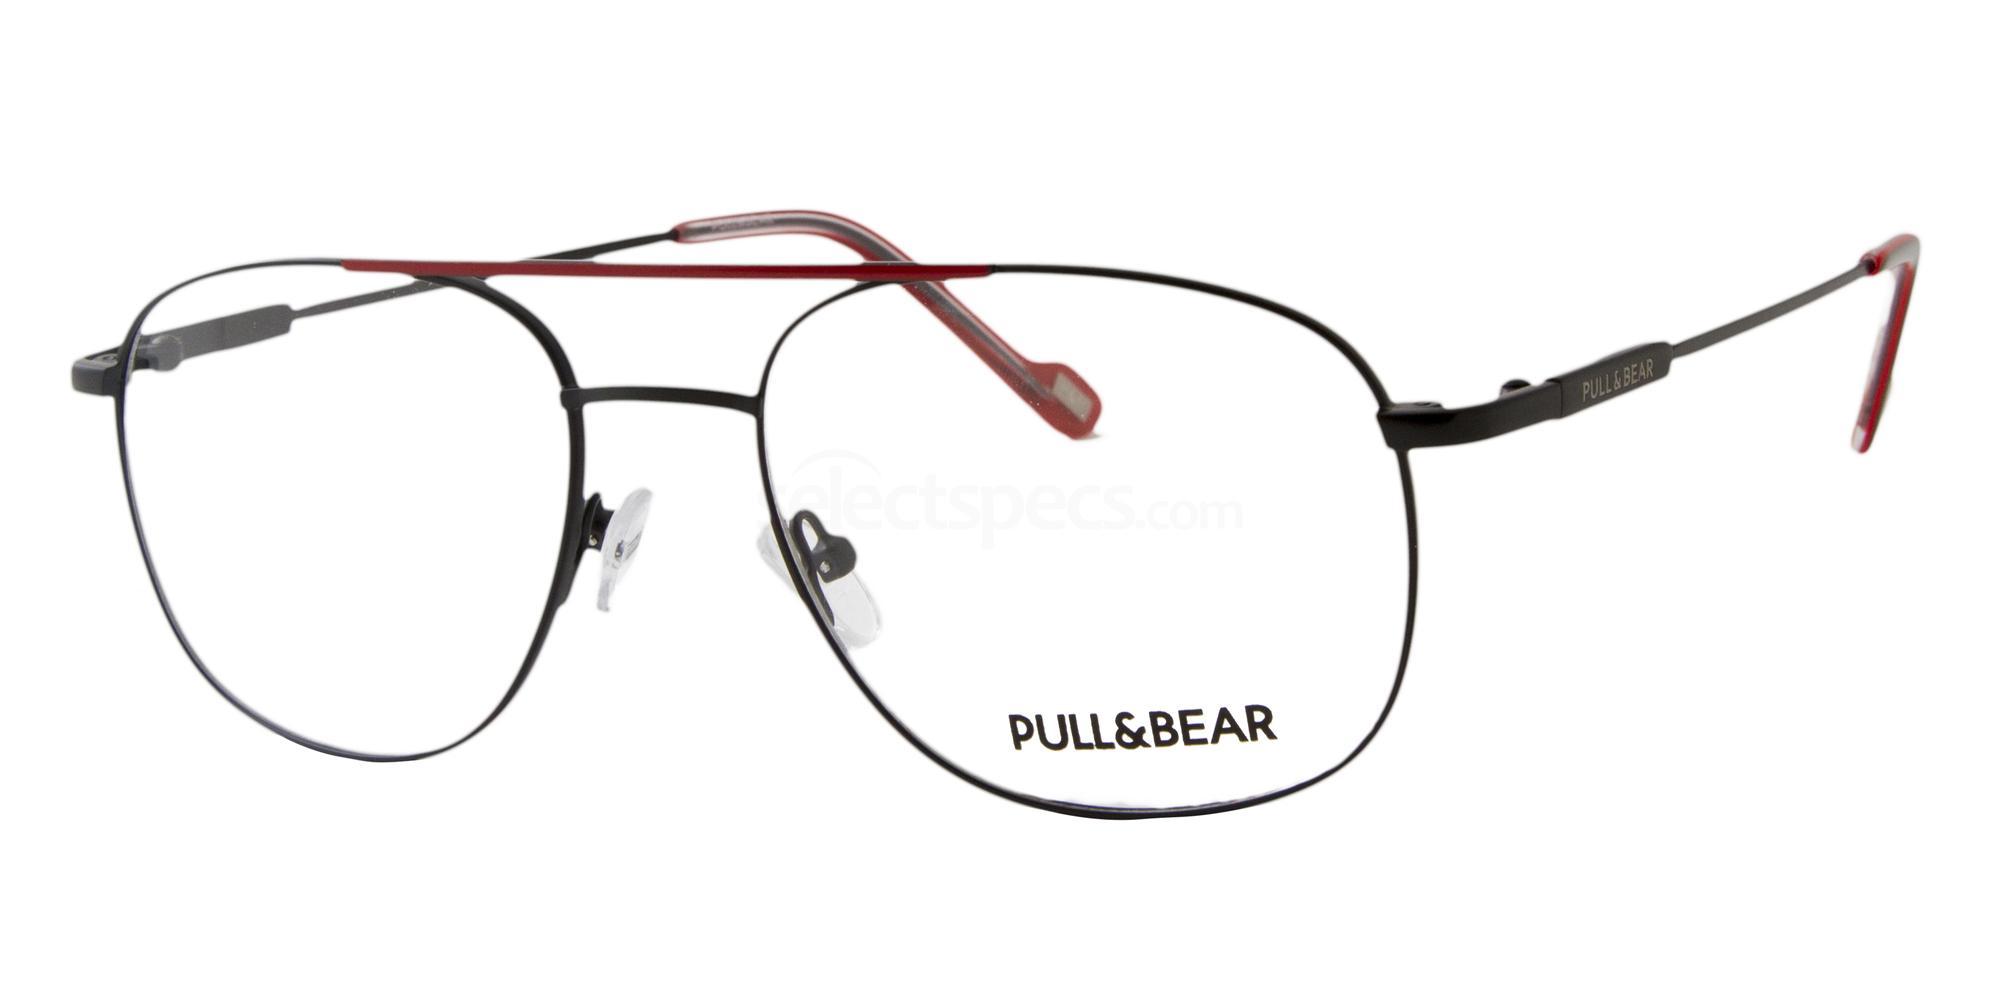 C1 PBG1865 Glasses, PULL&BEAR